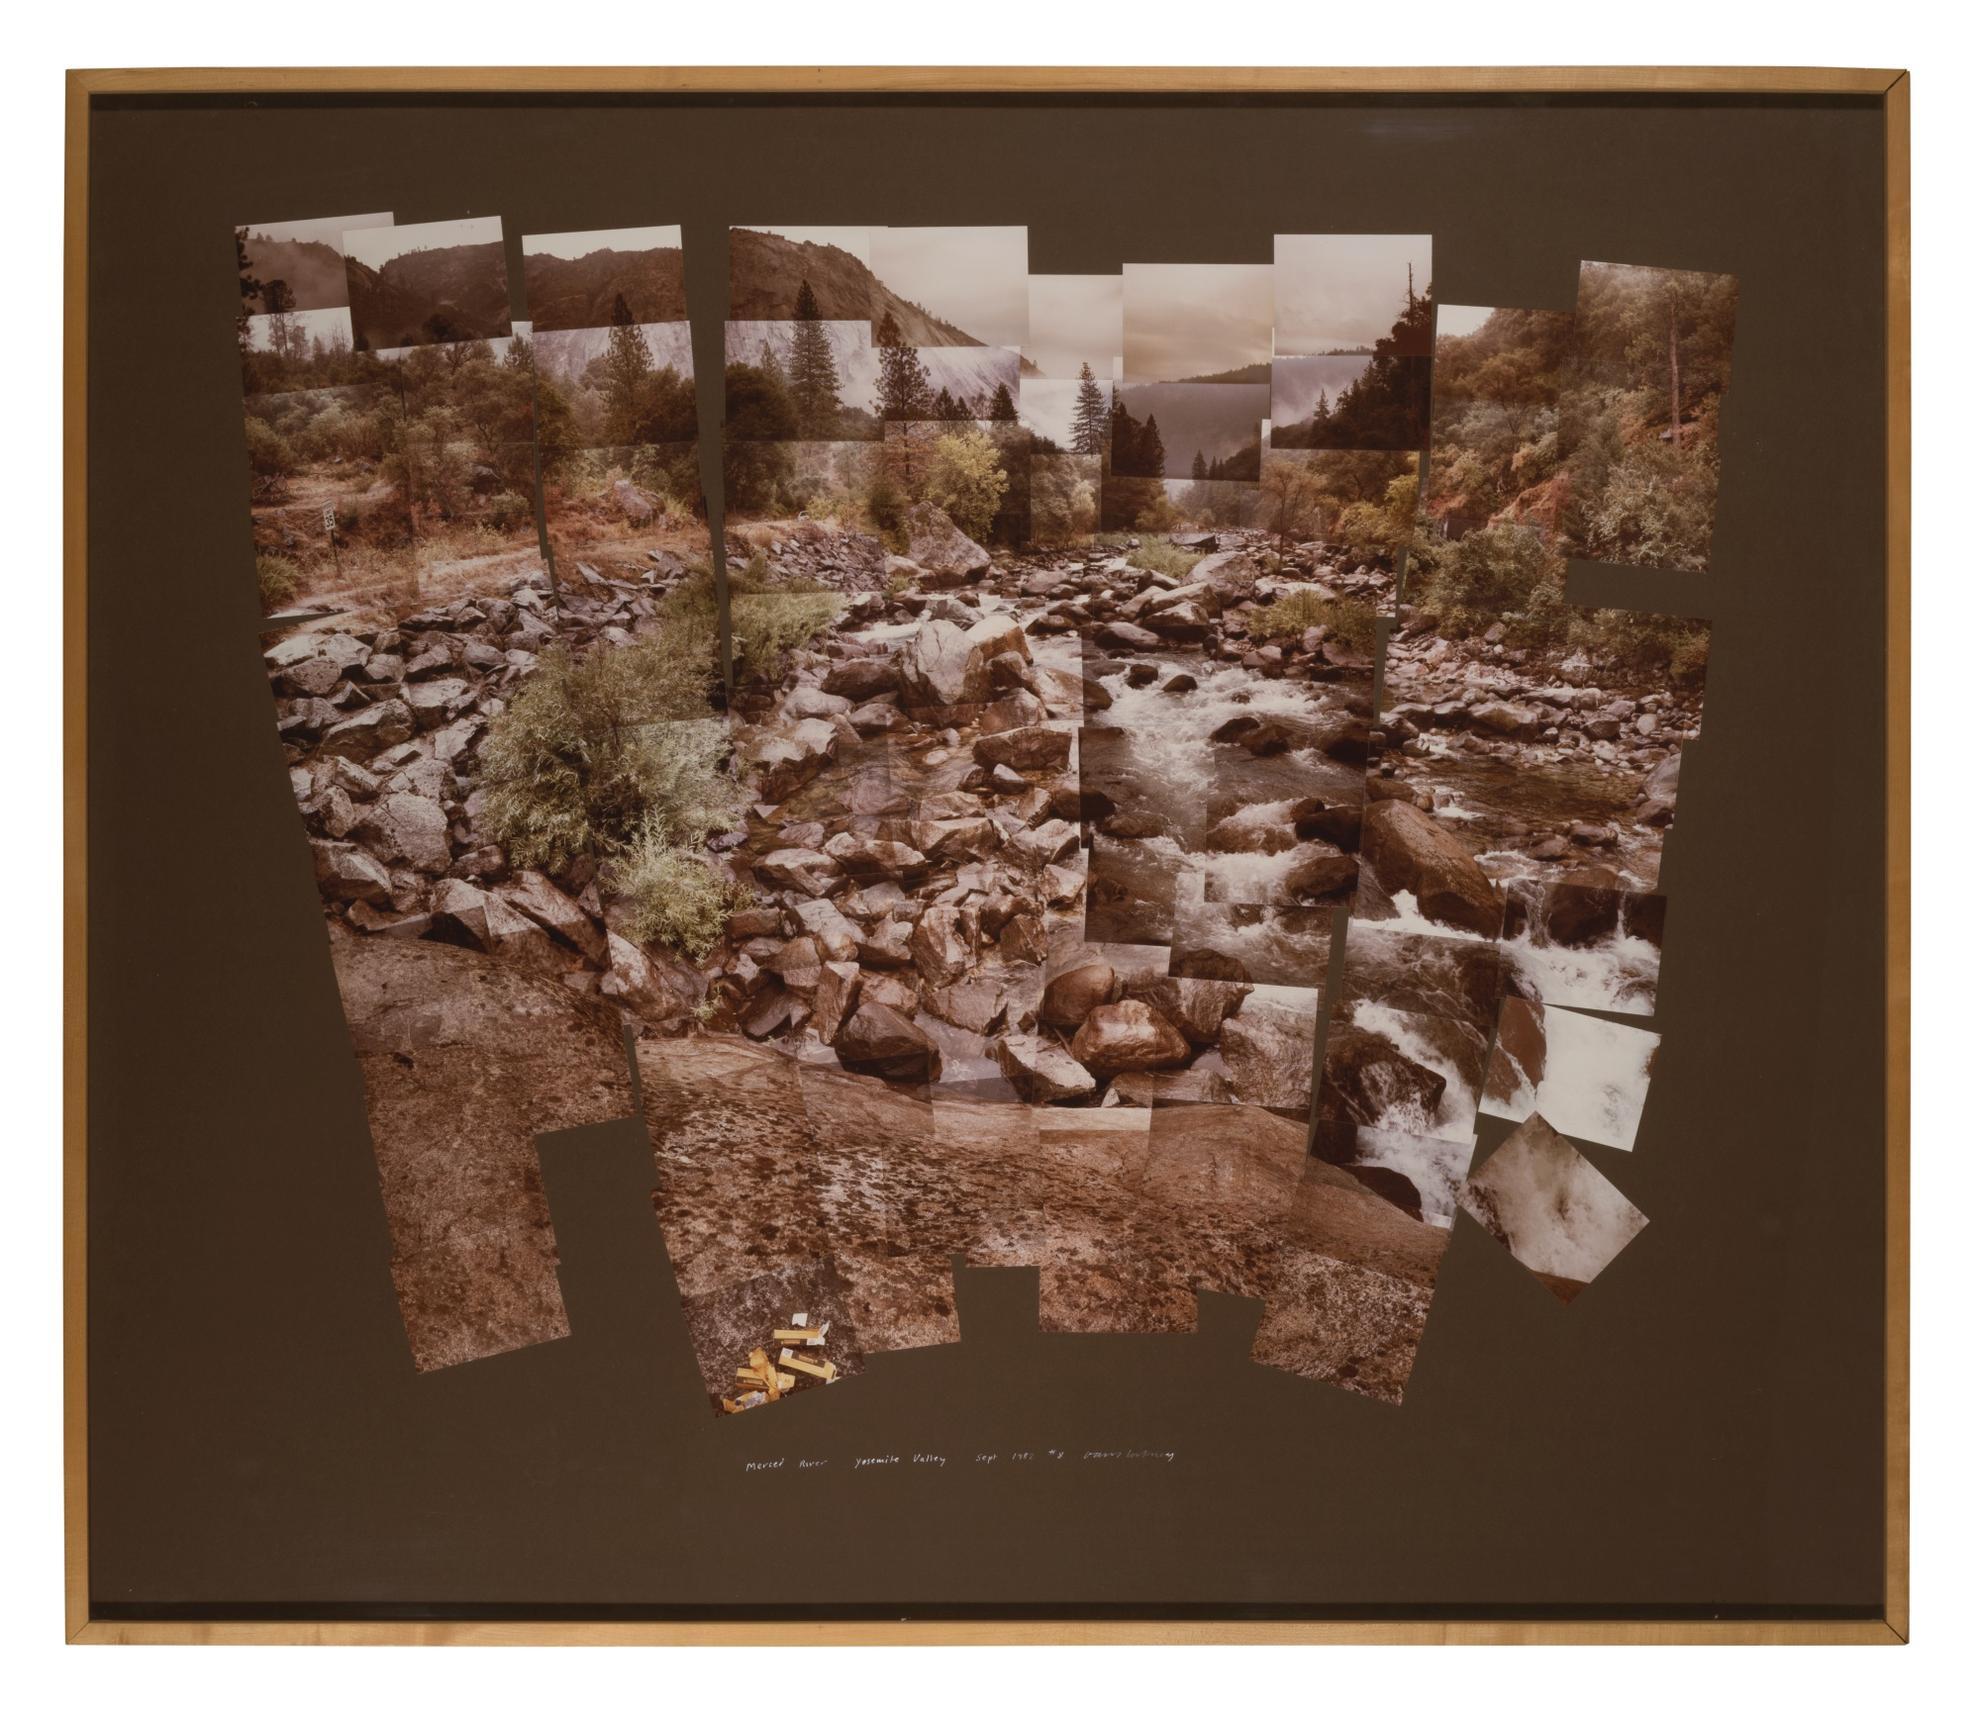 David Hockney-The Merced River, Yosemite Valley-1982